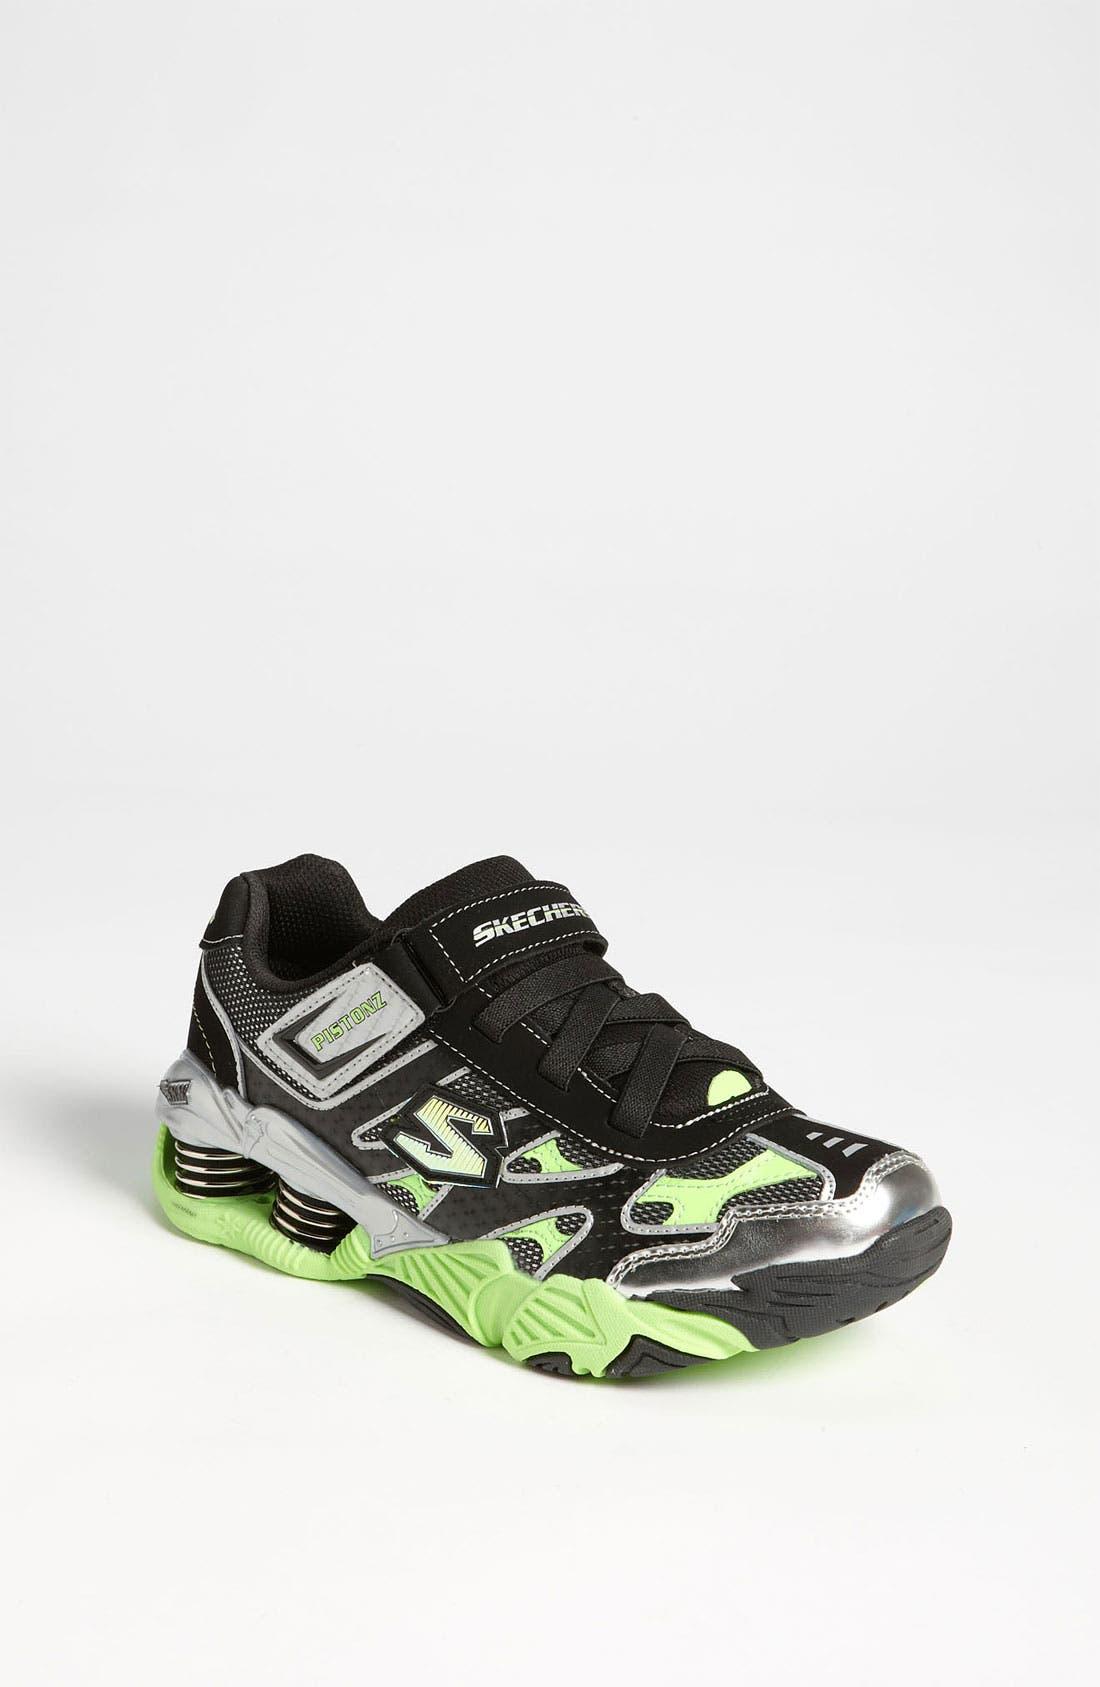 Main Image - SKECHERS 'Pistonz' Sneaker (Toddler, Little Kid & Big Kid)